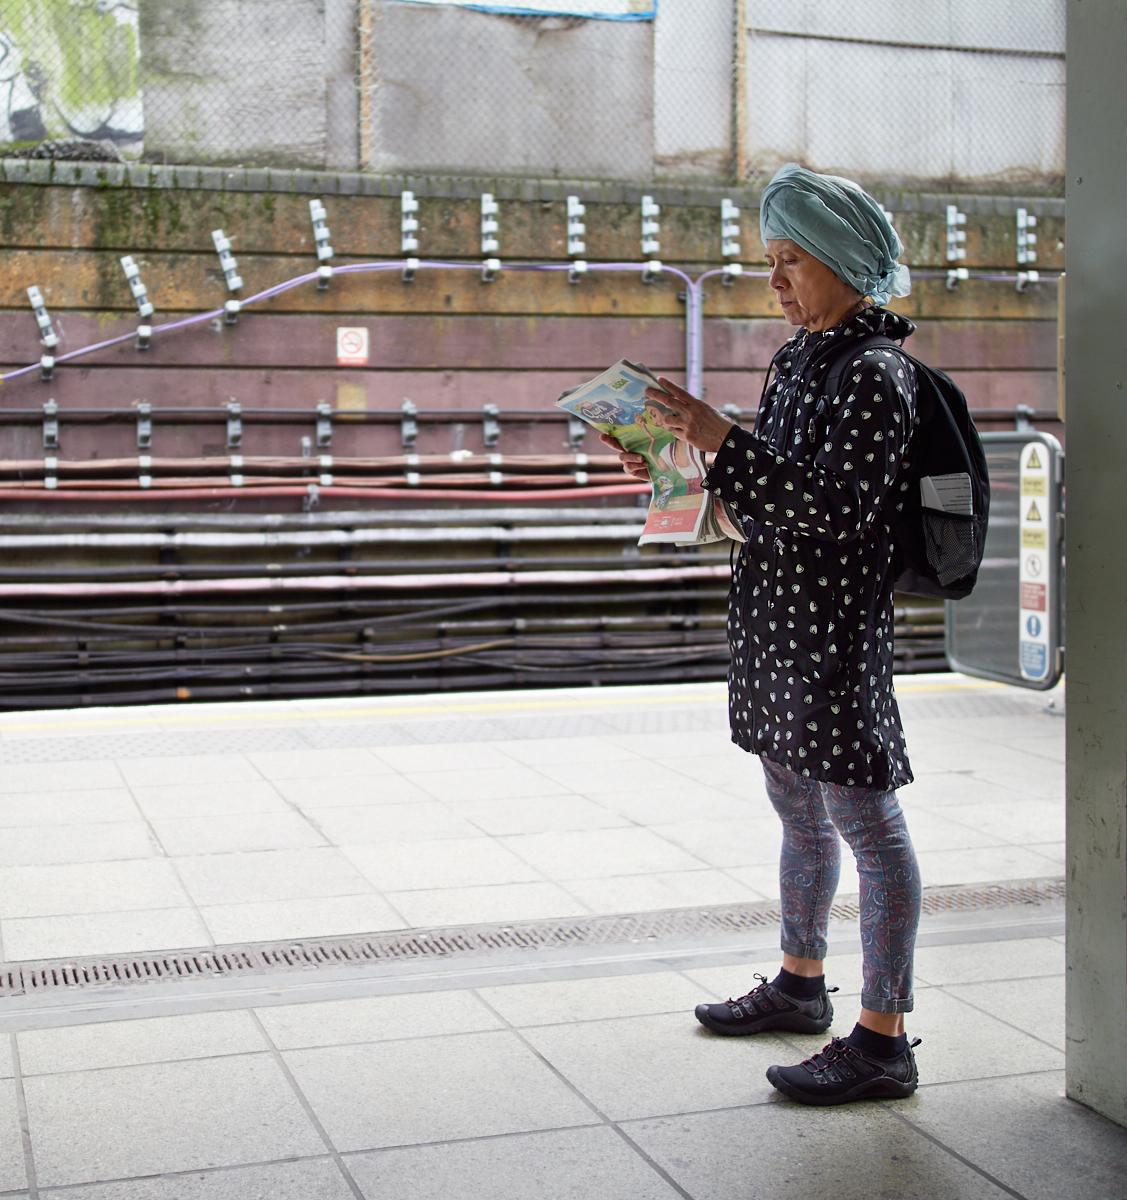 Whitechapel station1600x1200 sRGB 2.jpg